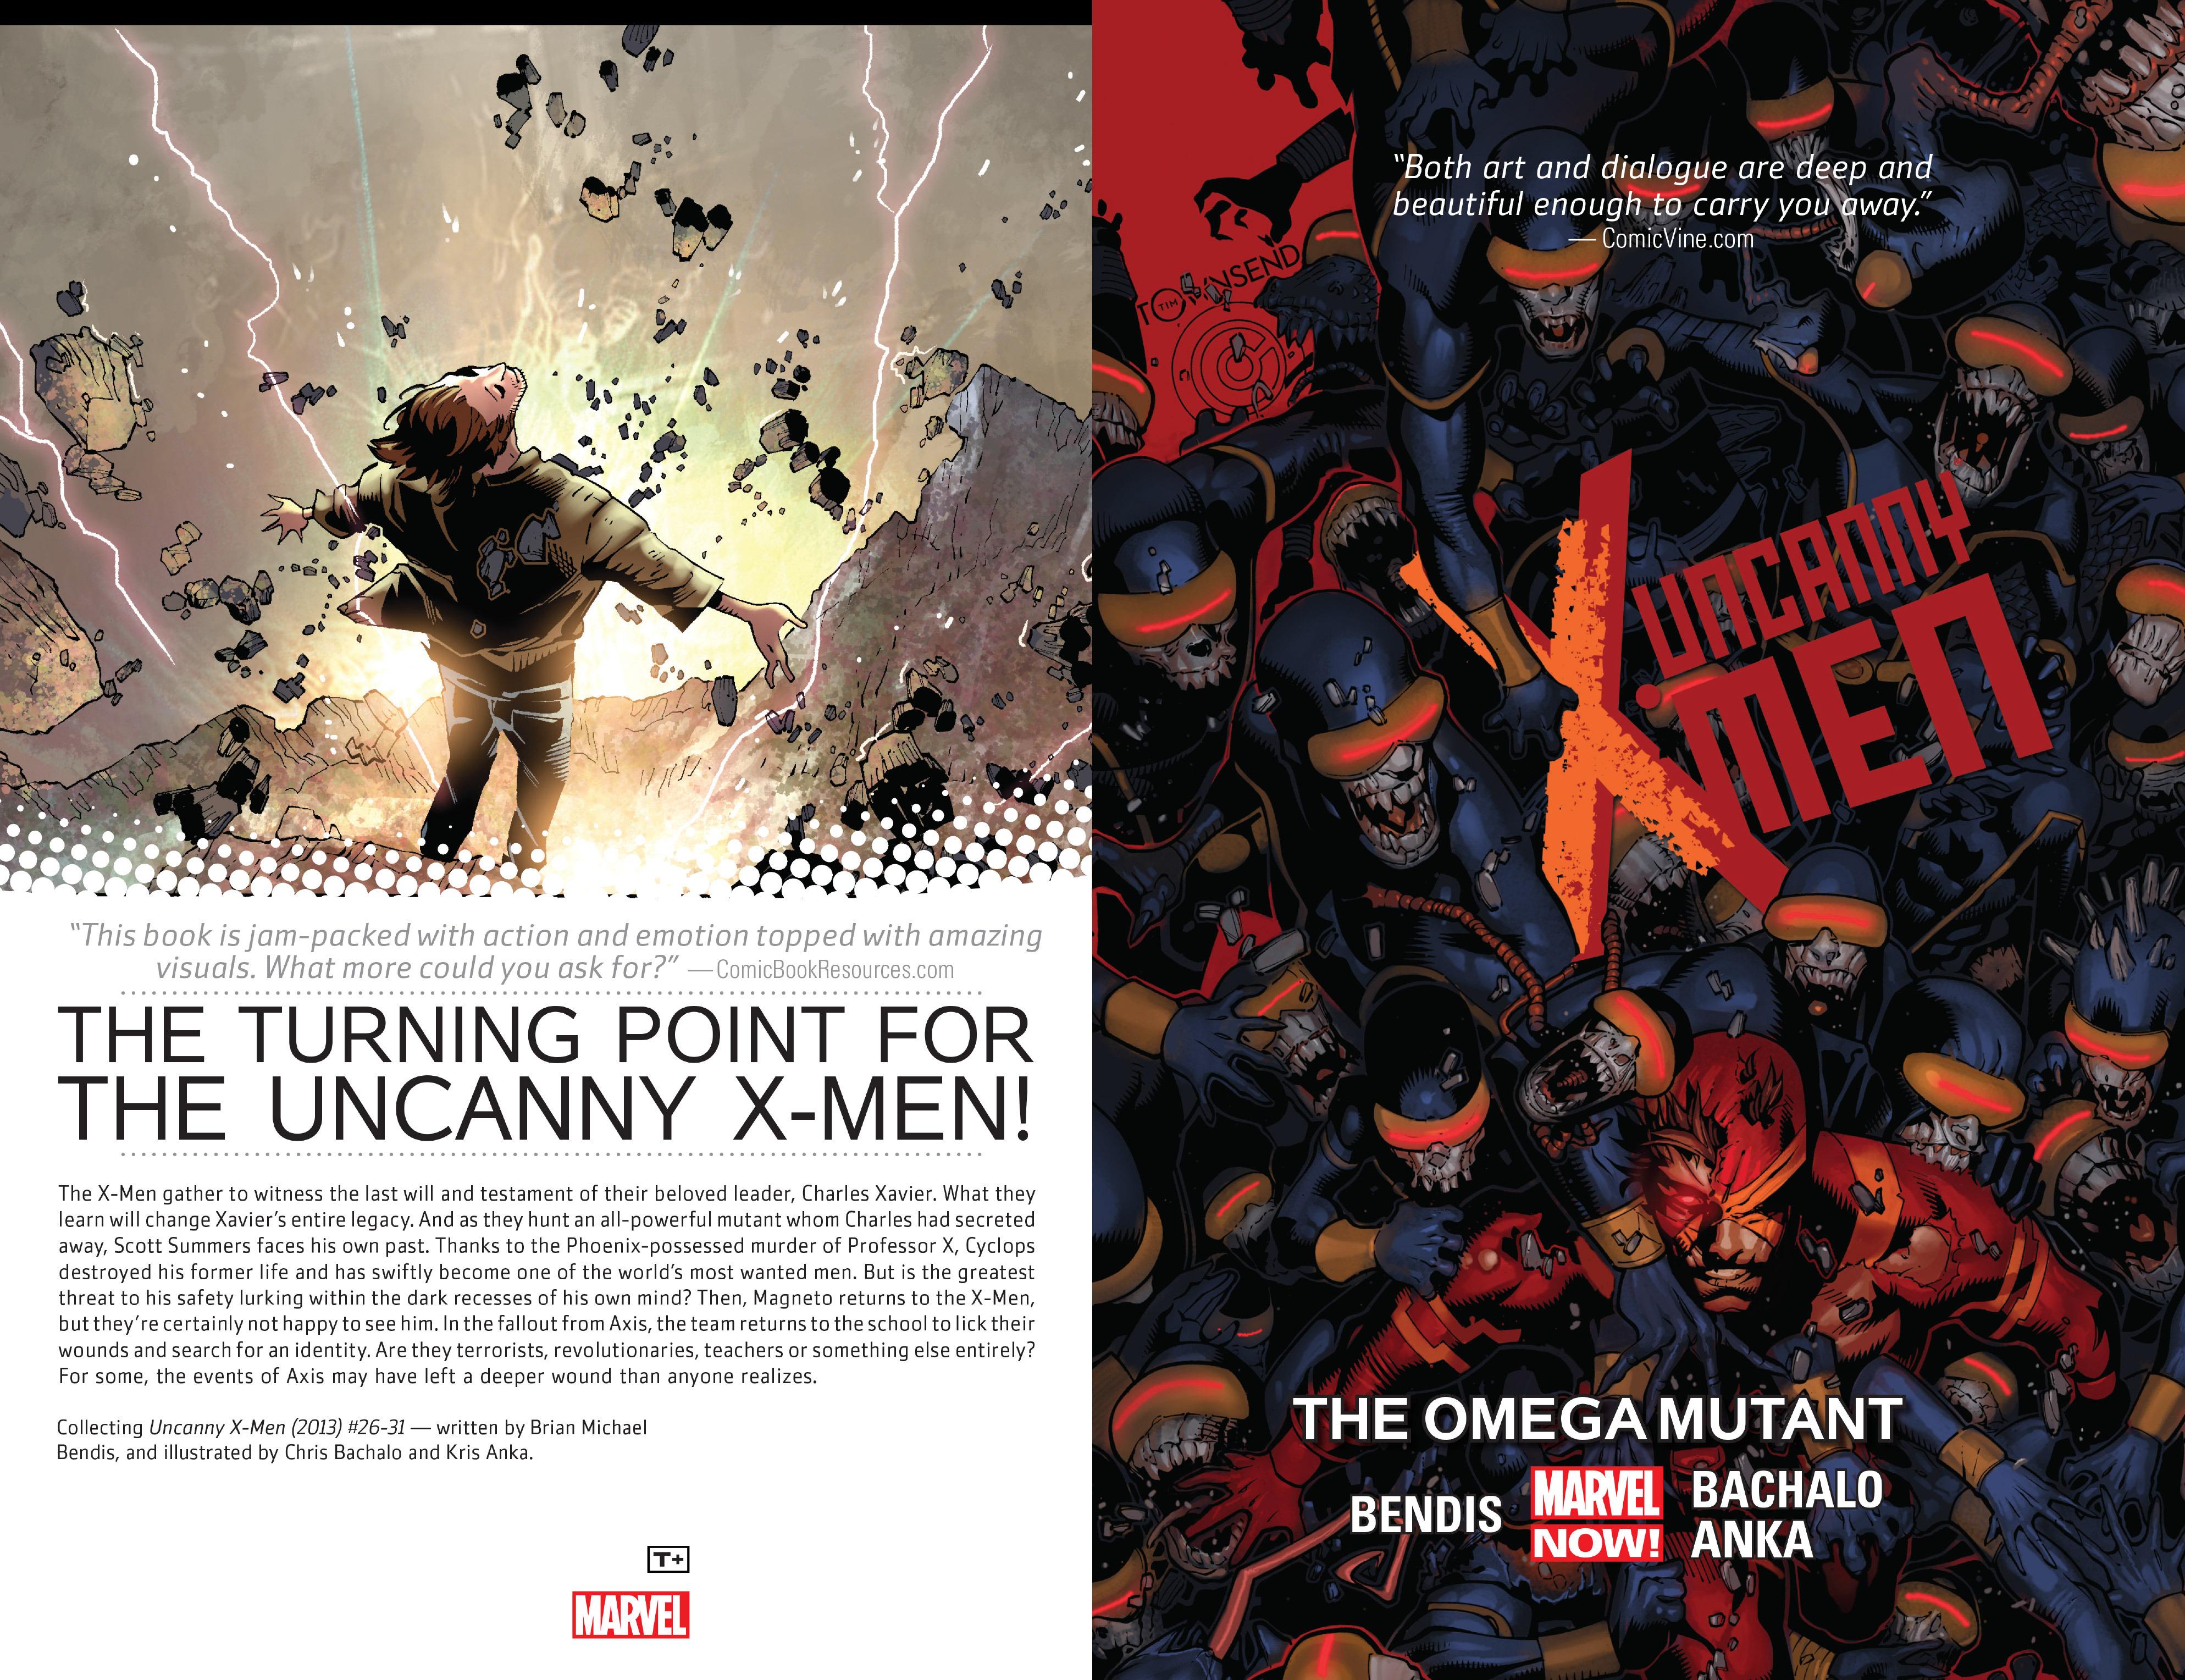 Read online Uncanny X-Men (2013) comic -  Issue # _TPB 5 - The Omega Mutant - 2